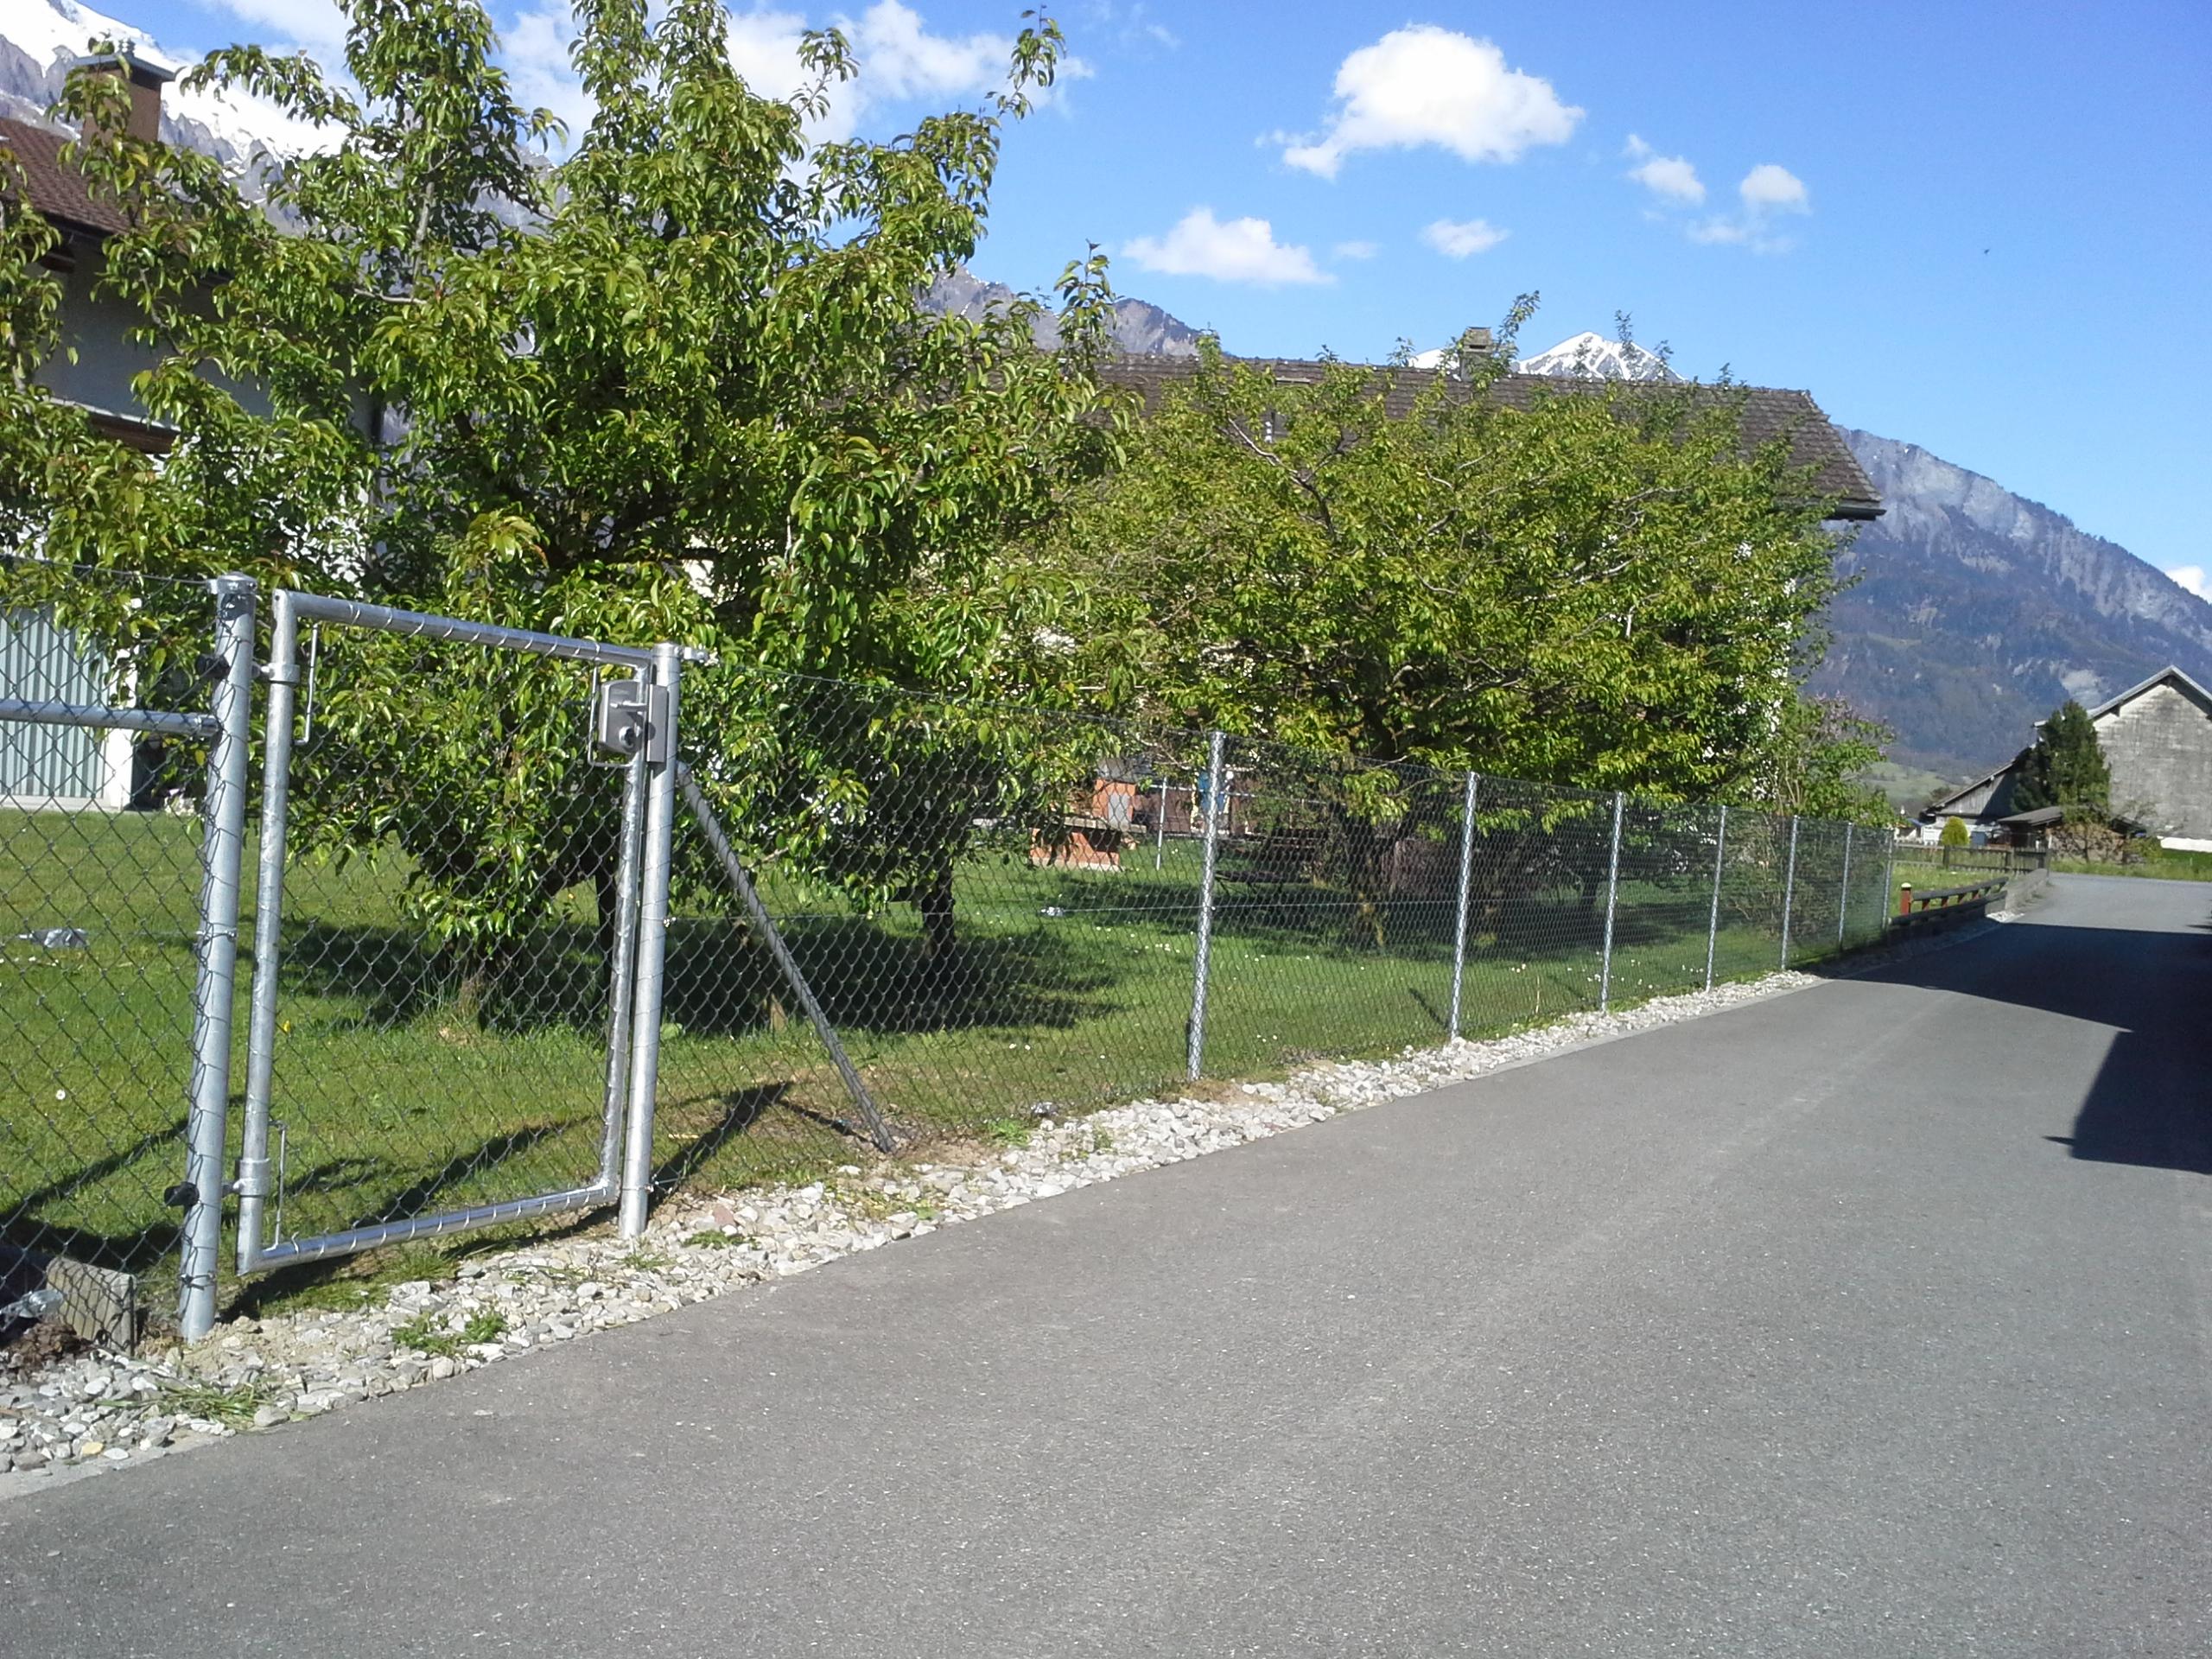 Diagonalgeflechtzaun in Bad Ragaz(SG